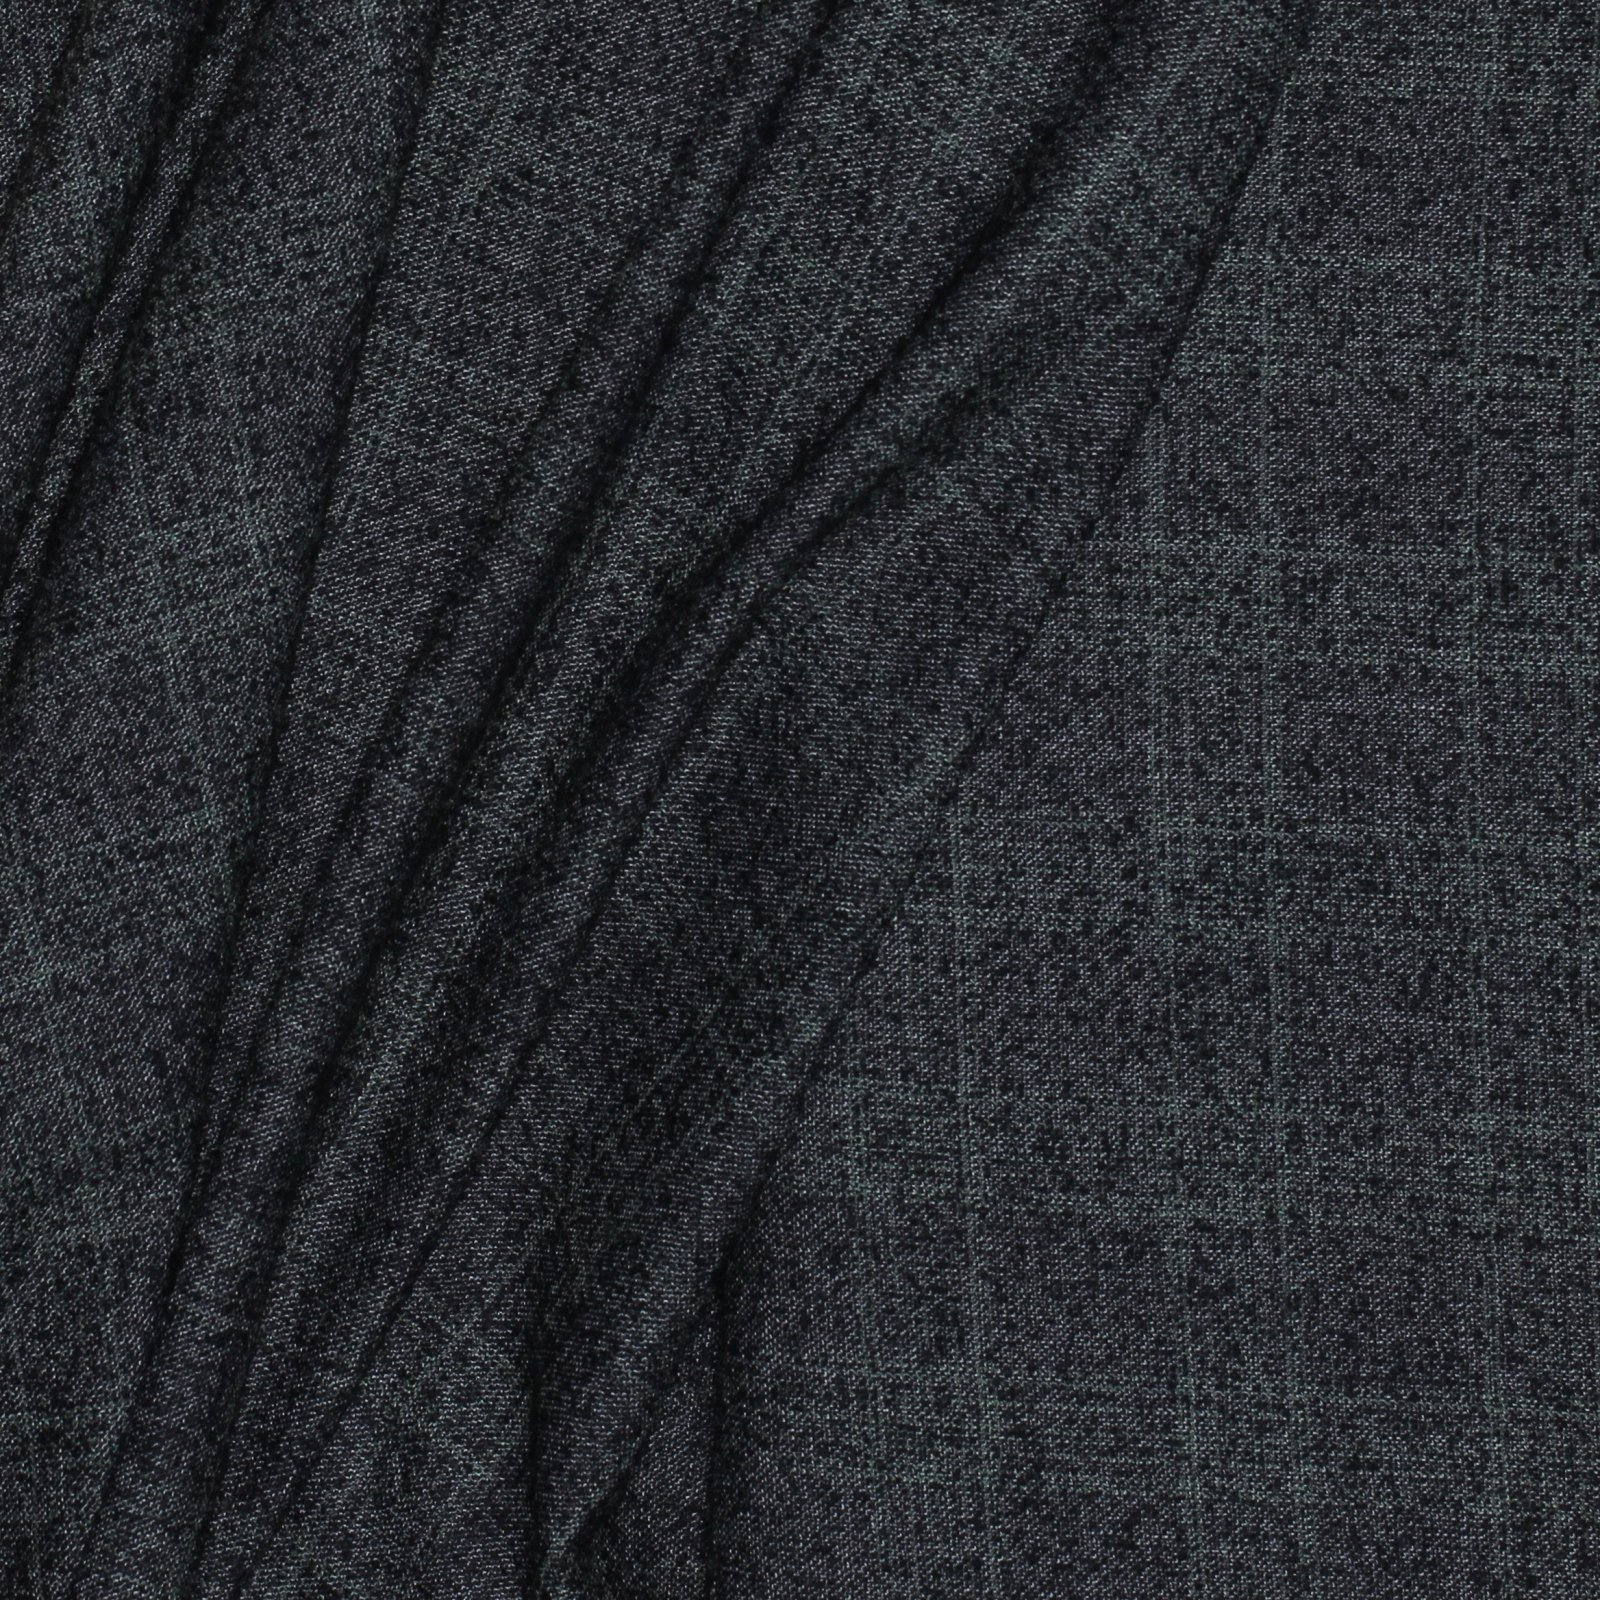 Black w/Subtle Green Plaid Italian Wool Blend